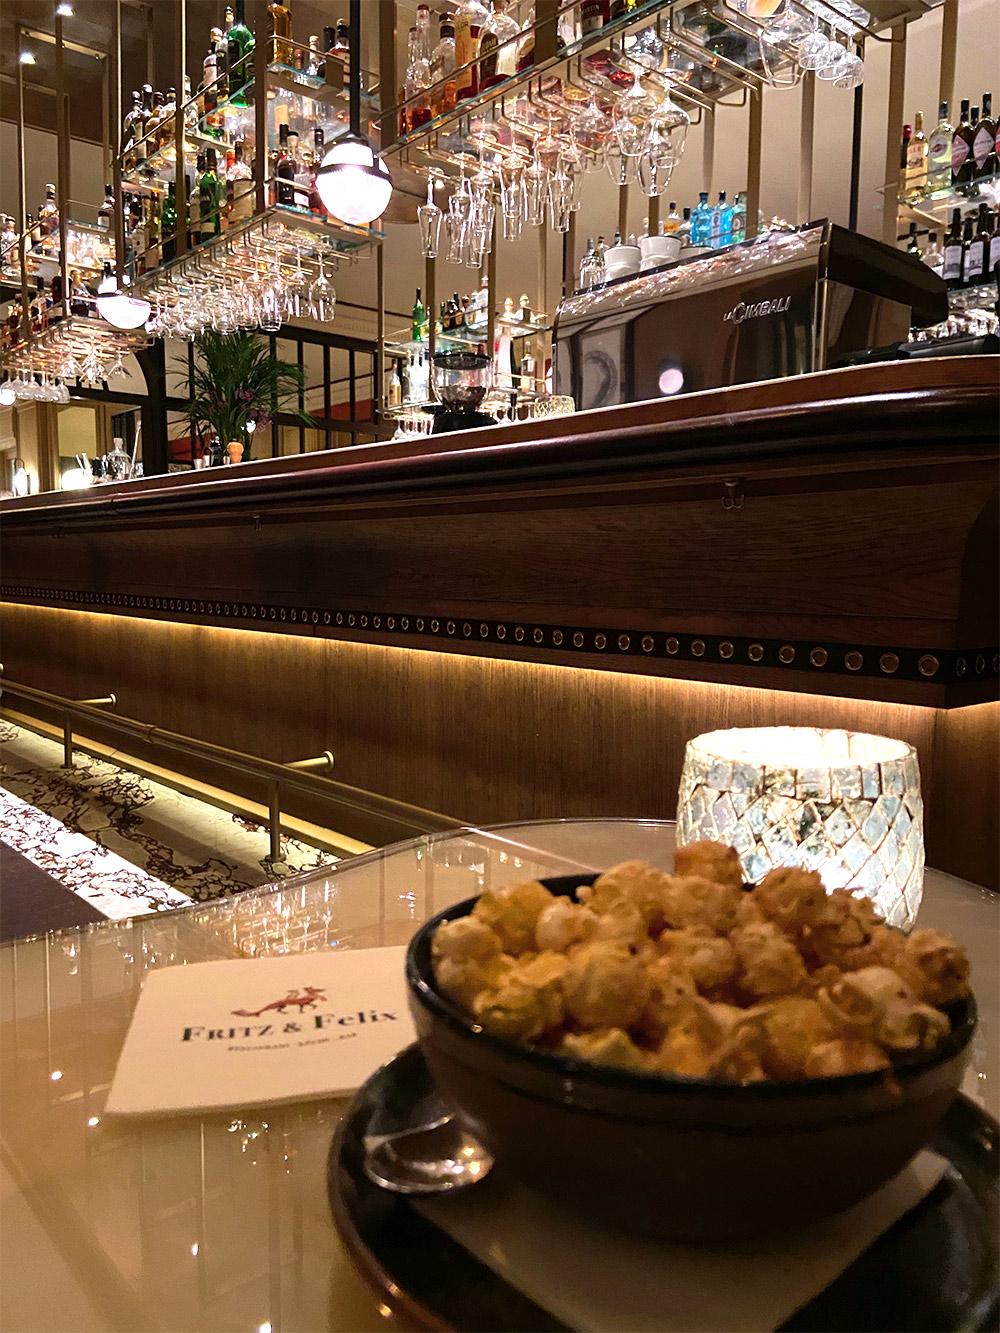 FINESSE, Magazin, Brenners Park Hotel, Travel, Gourmet, Reise, Selektion Deutscher Luxushotels, Fritz & Felix, Farid Fazel, Bar, Popcorn